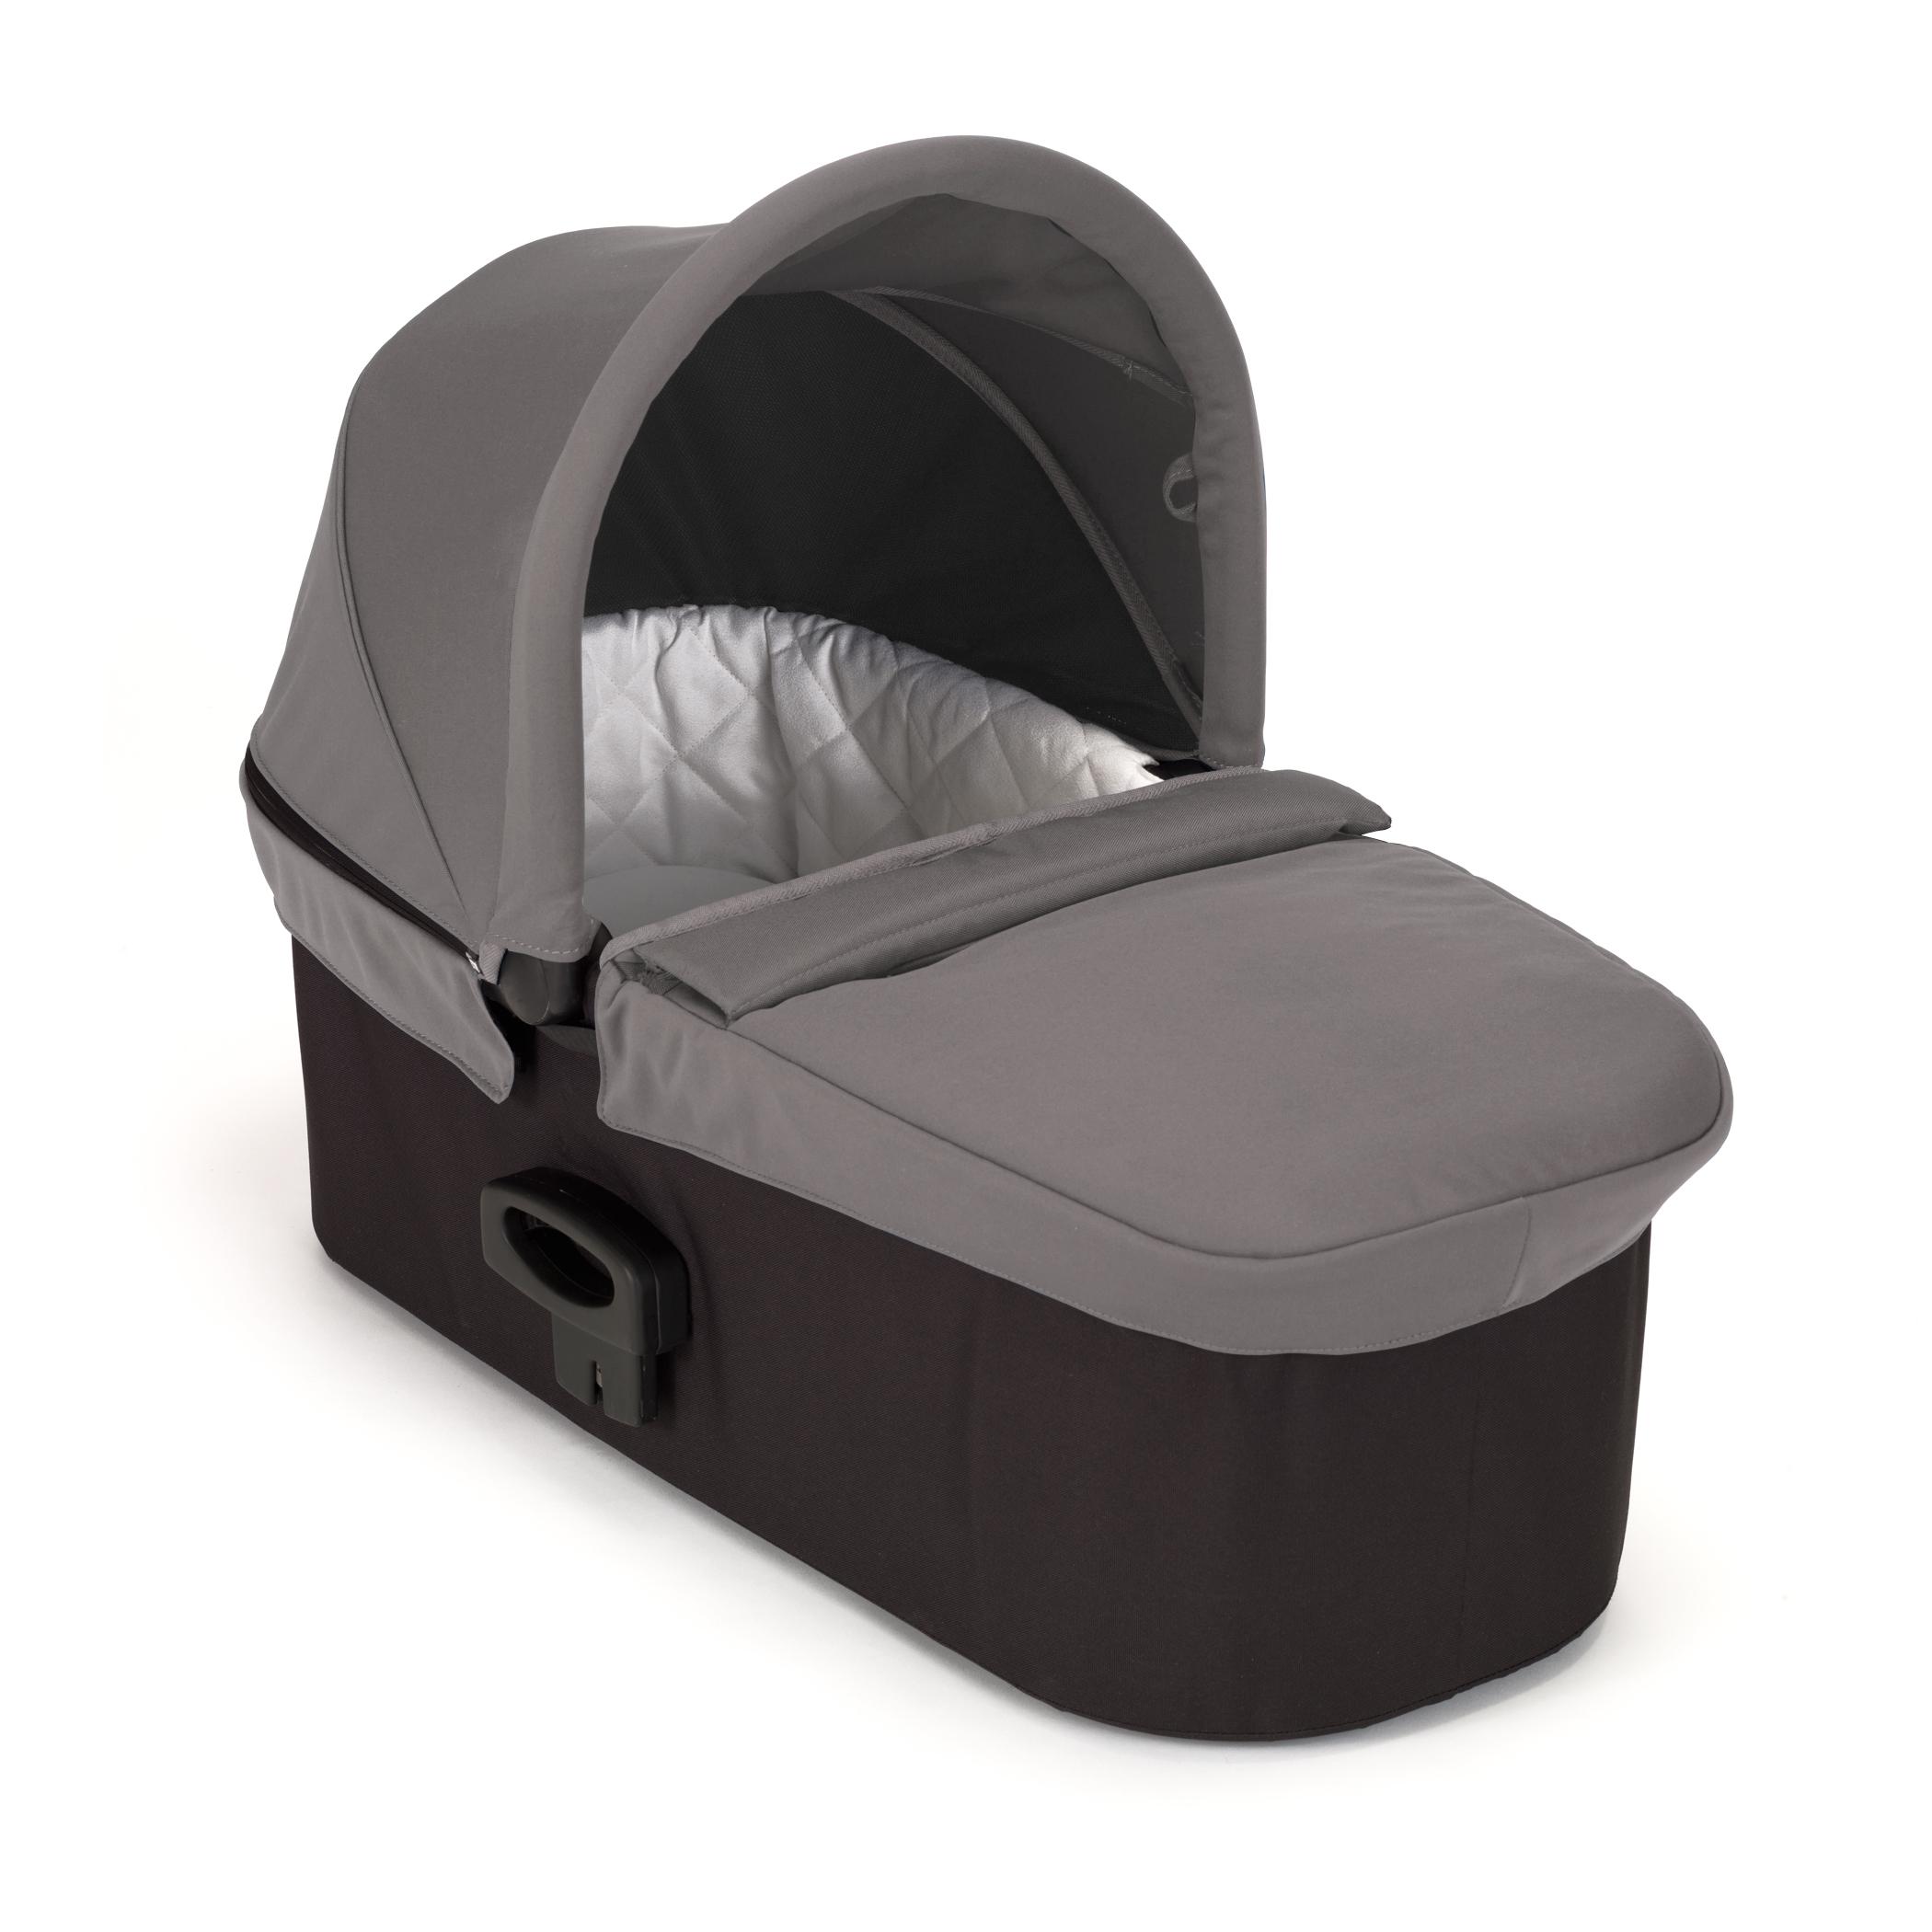 Baby Jogger City Mini Single Stroller Plus Accessories